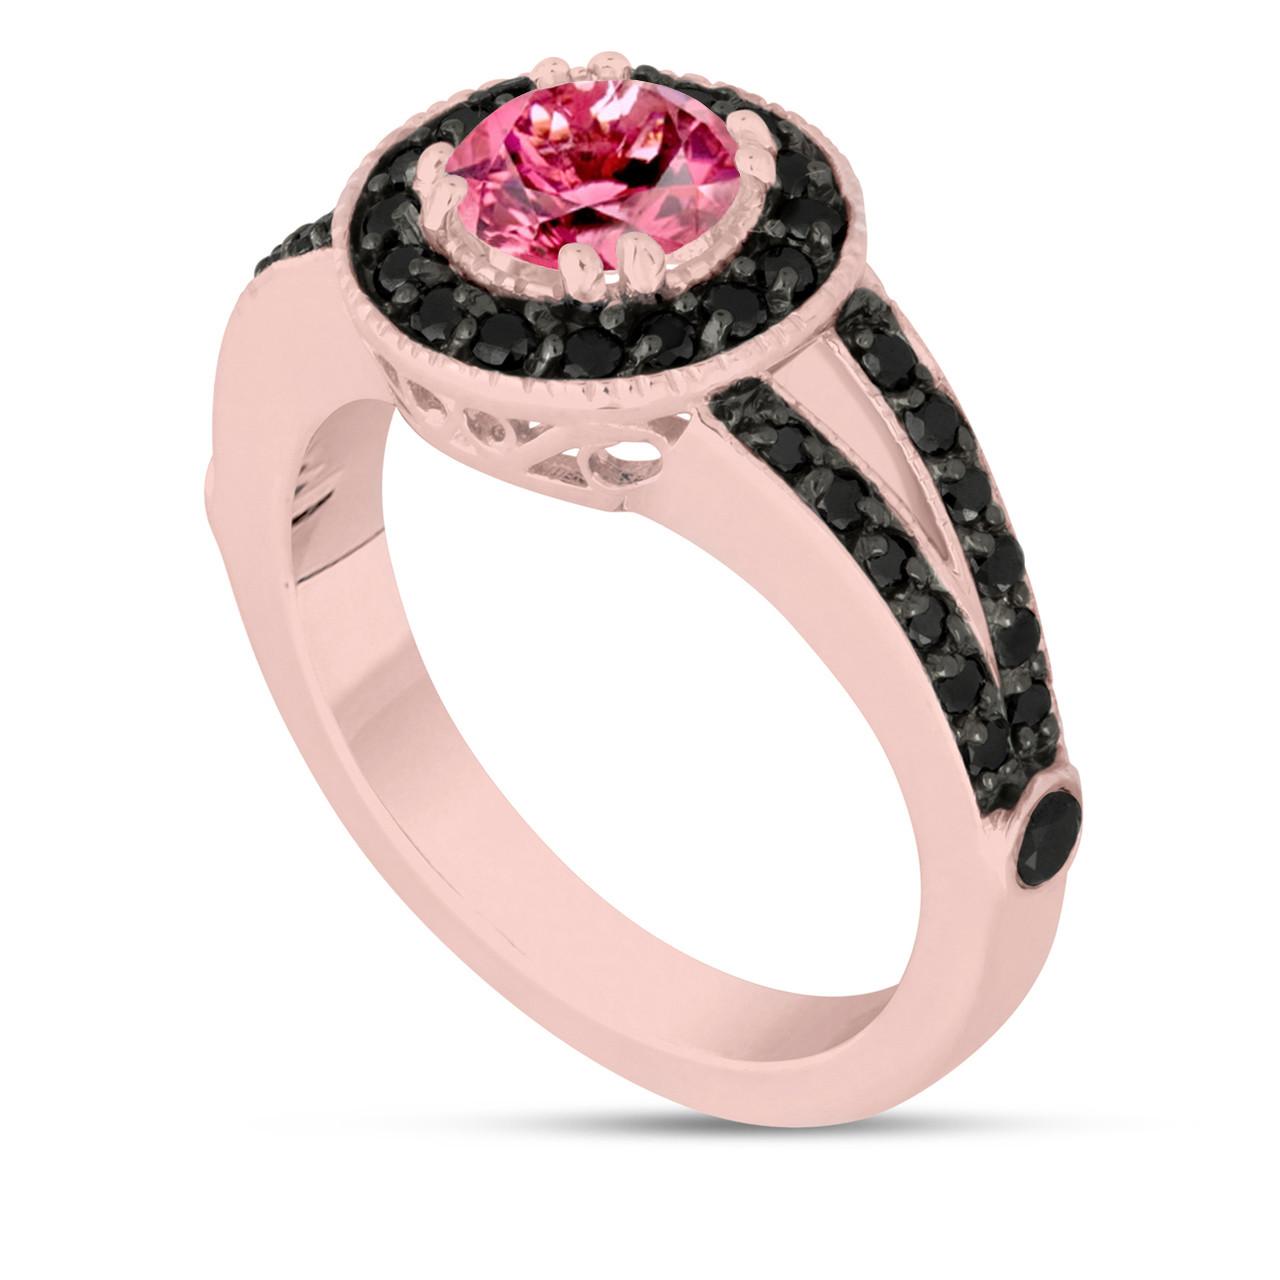 Pink Tourmaline Engagement Ring 14k Rose Gold 1.46 Carat Unique Pave ...